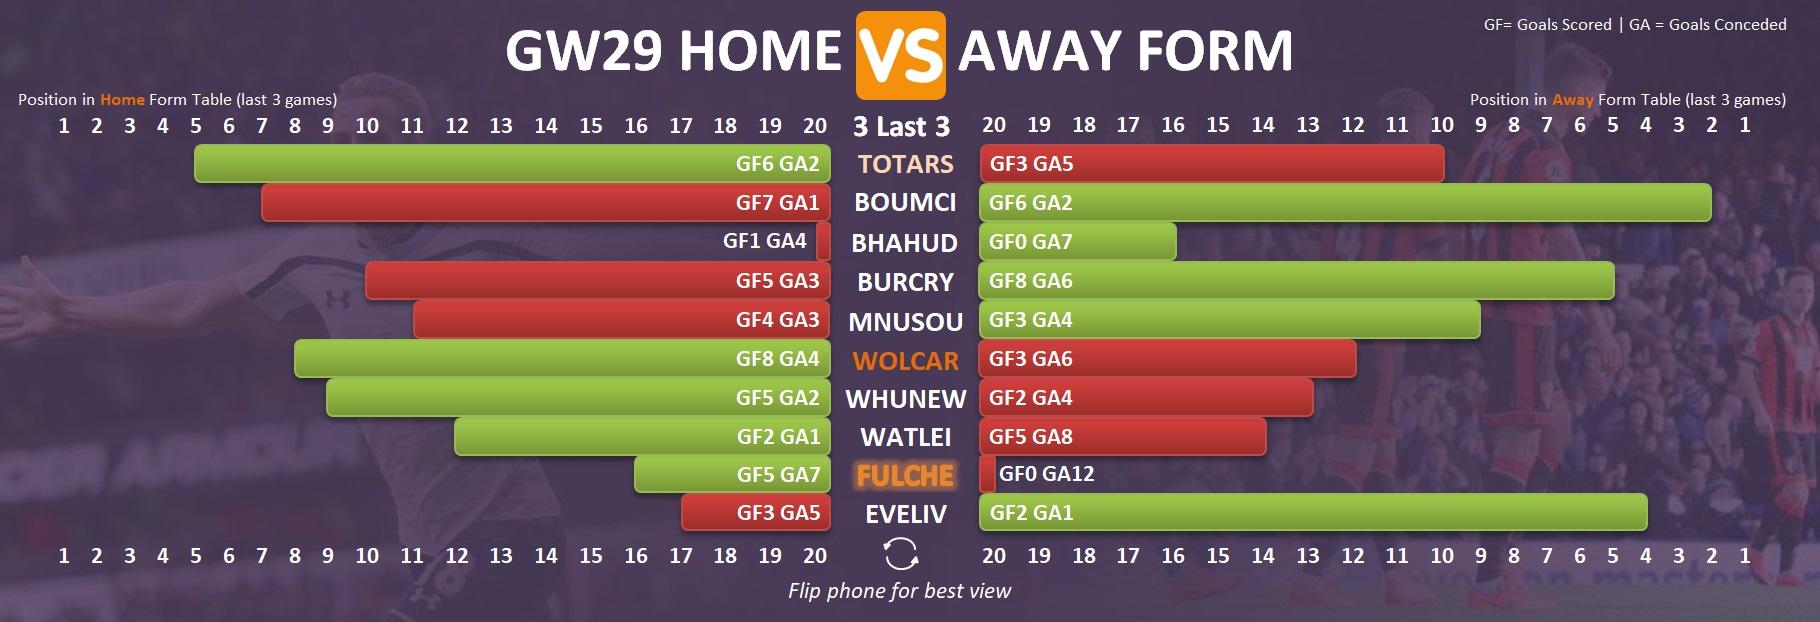 Fantasy Premier League Form Chart - Gameweek 29